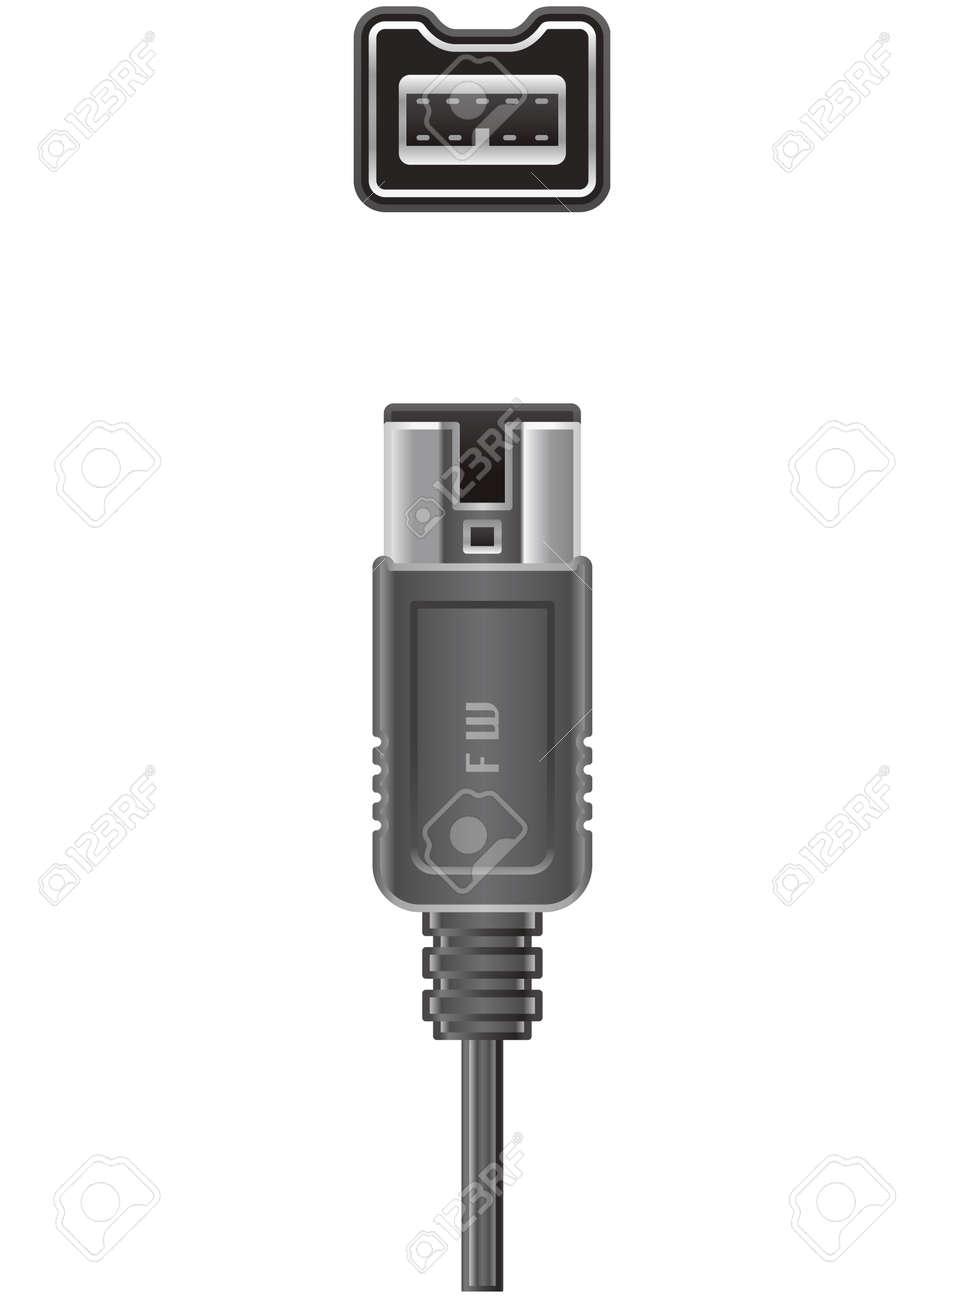 800 firewire symbol dolgular beautiful mac g5 firewire symbol images electrical diagram ideas buycottarizona